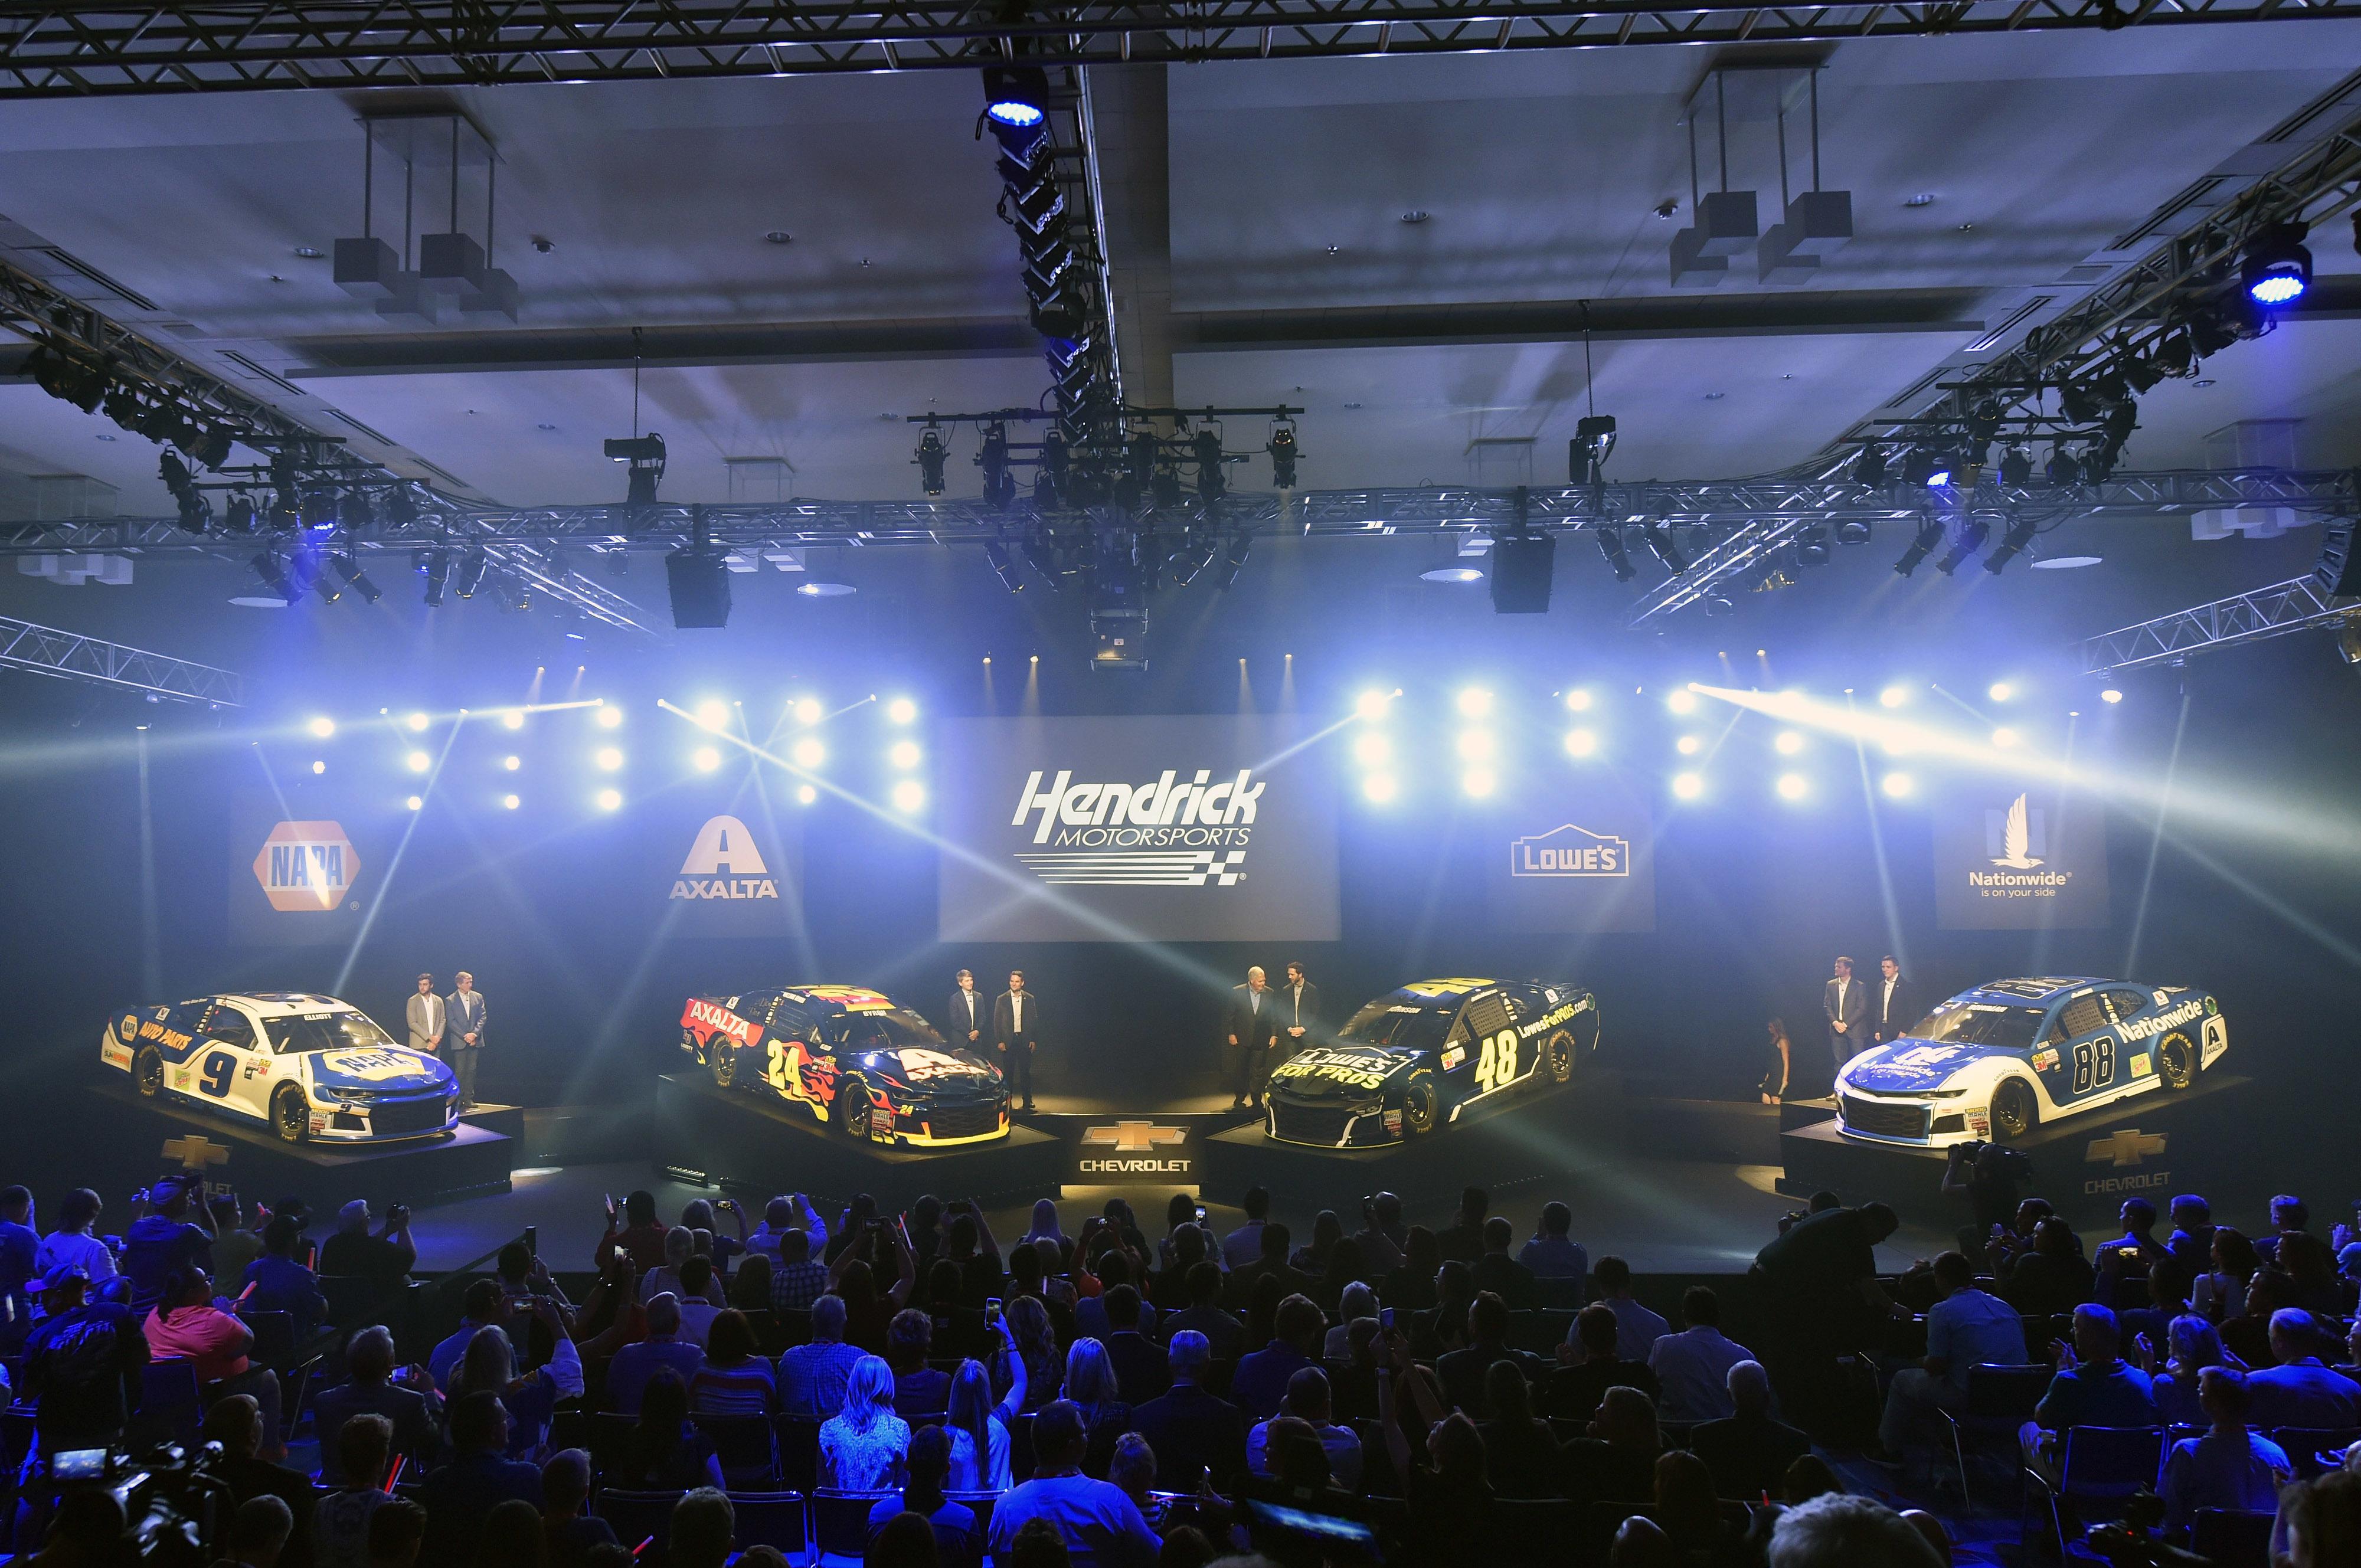 Hendrick Motors Of Charlotte >> 2018 Schemes Revealed In Thrilling Fashion Hendrick Motorsports